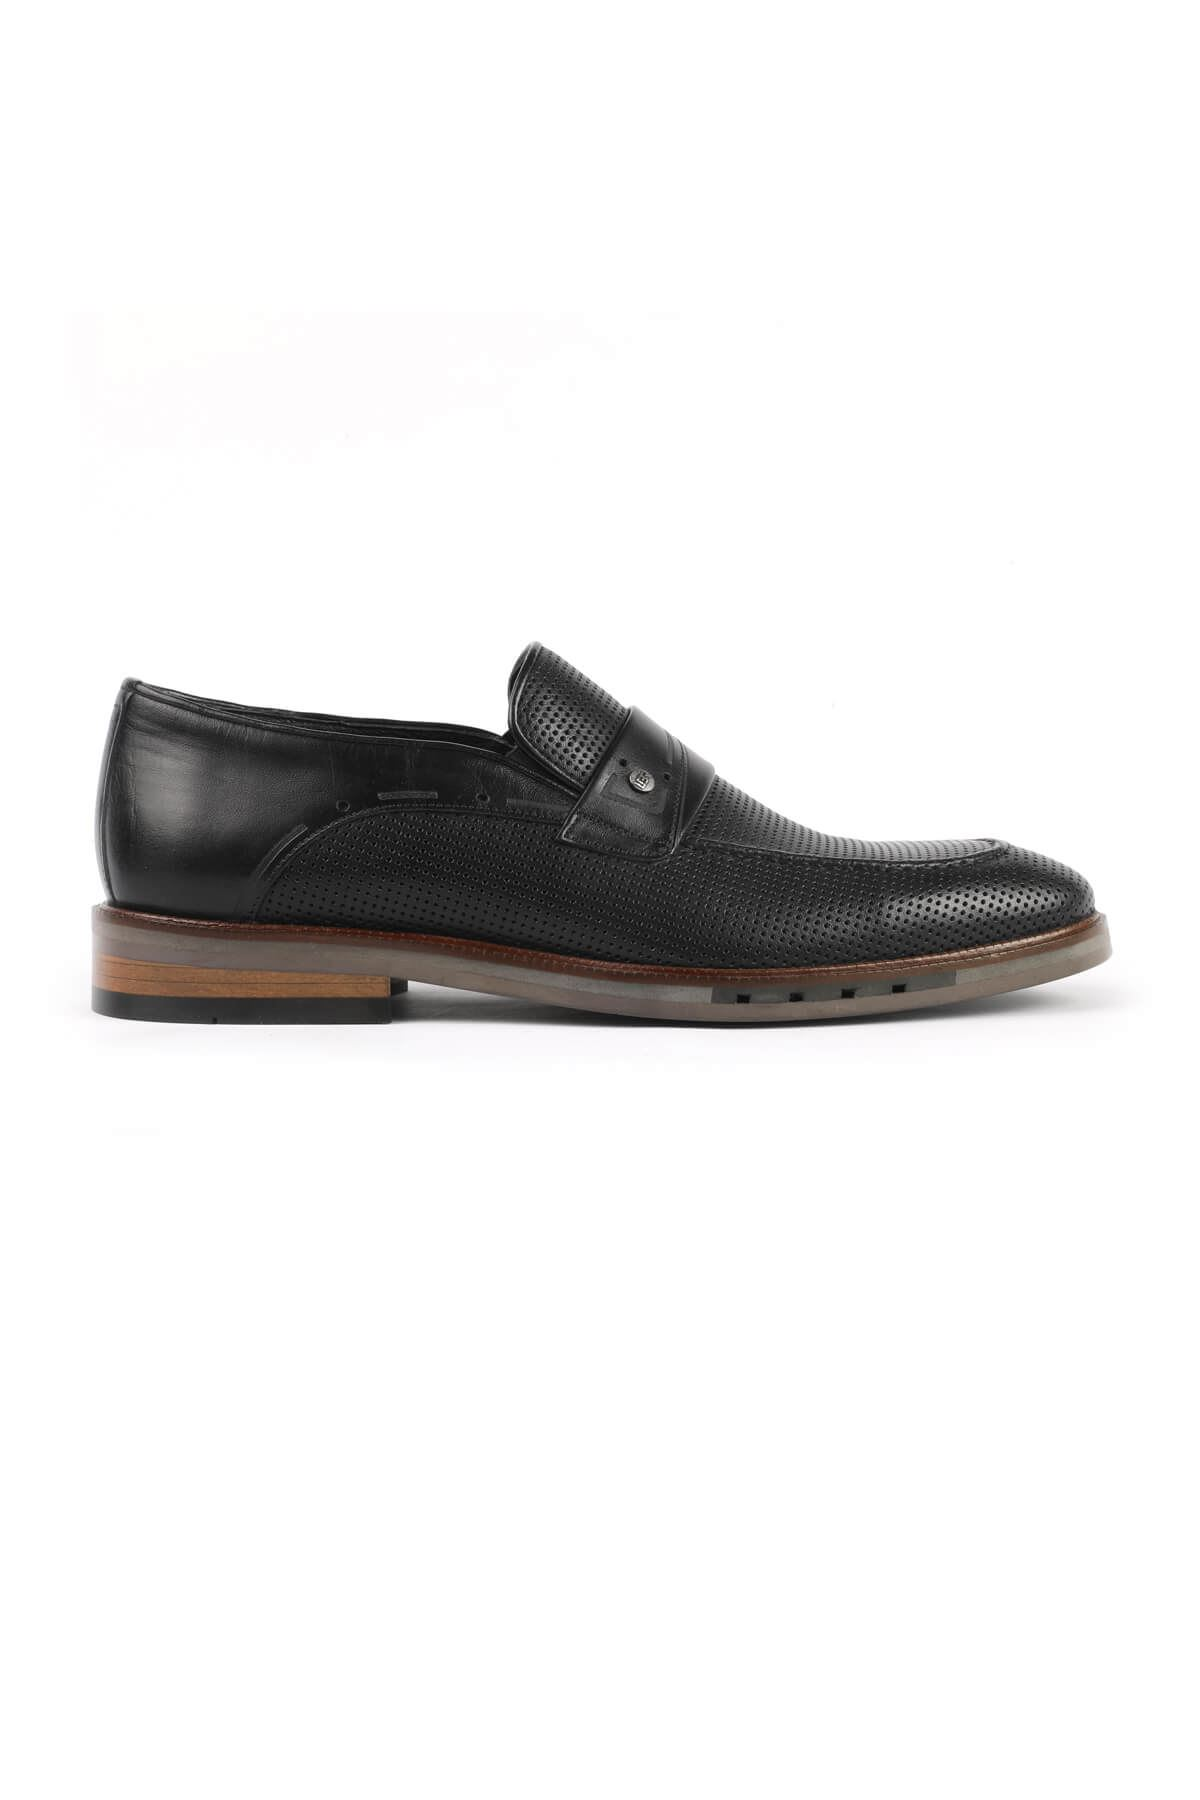 Libero 2943 Black Loafer Shoes